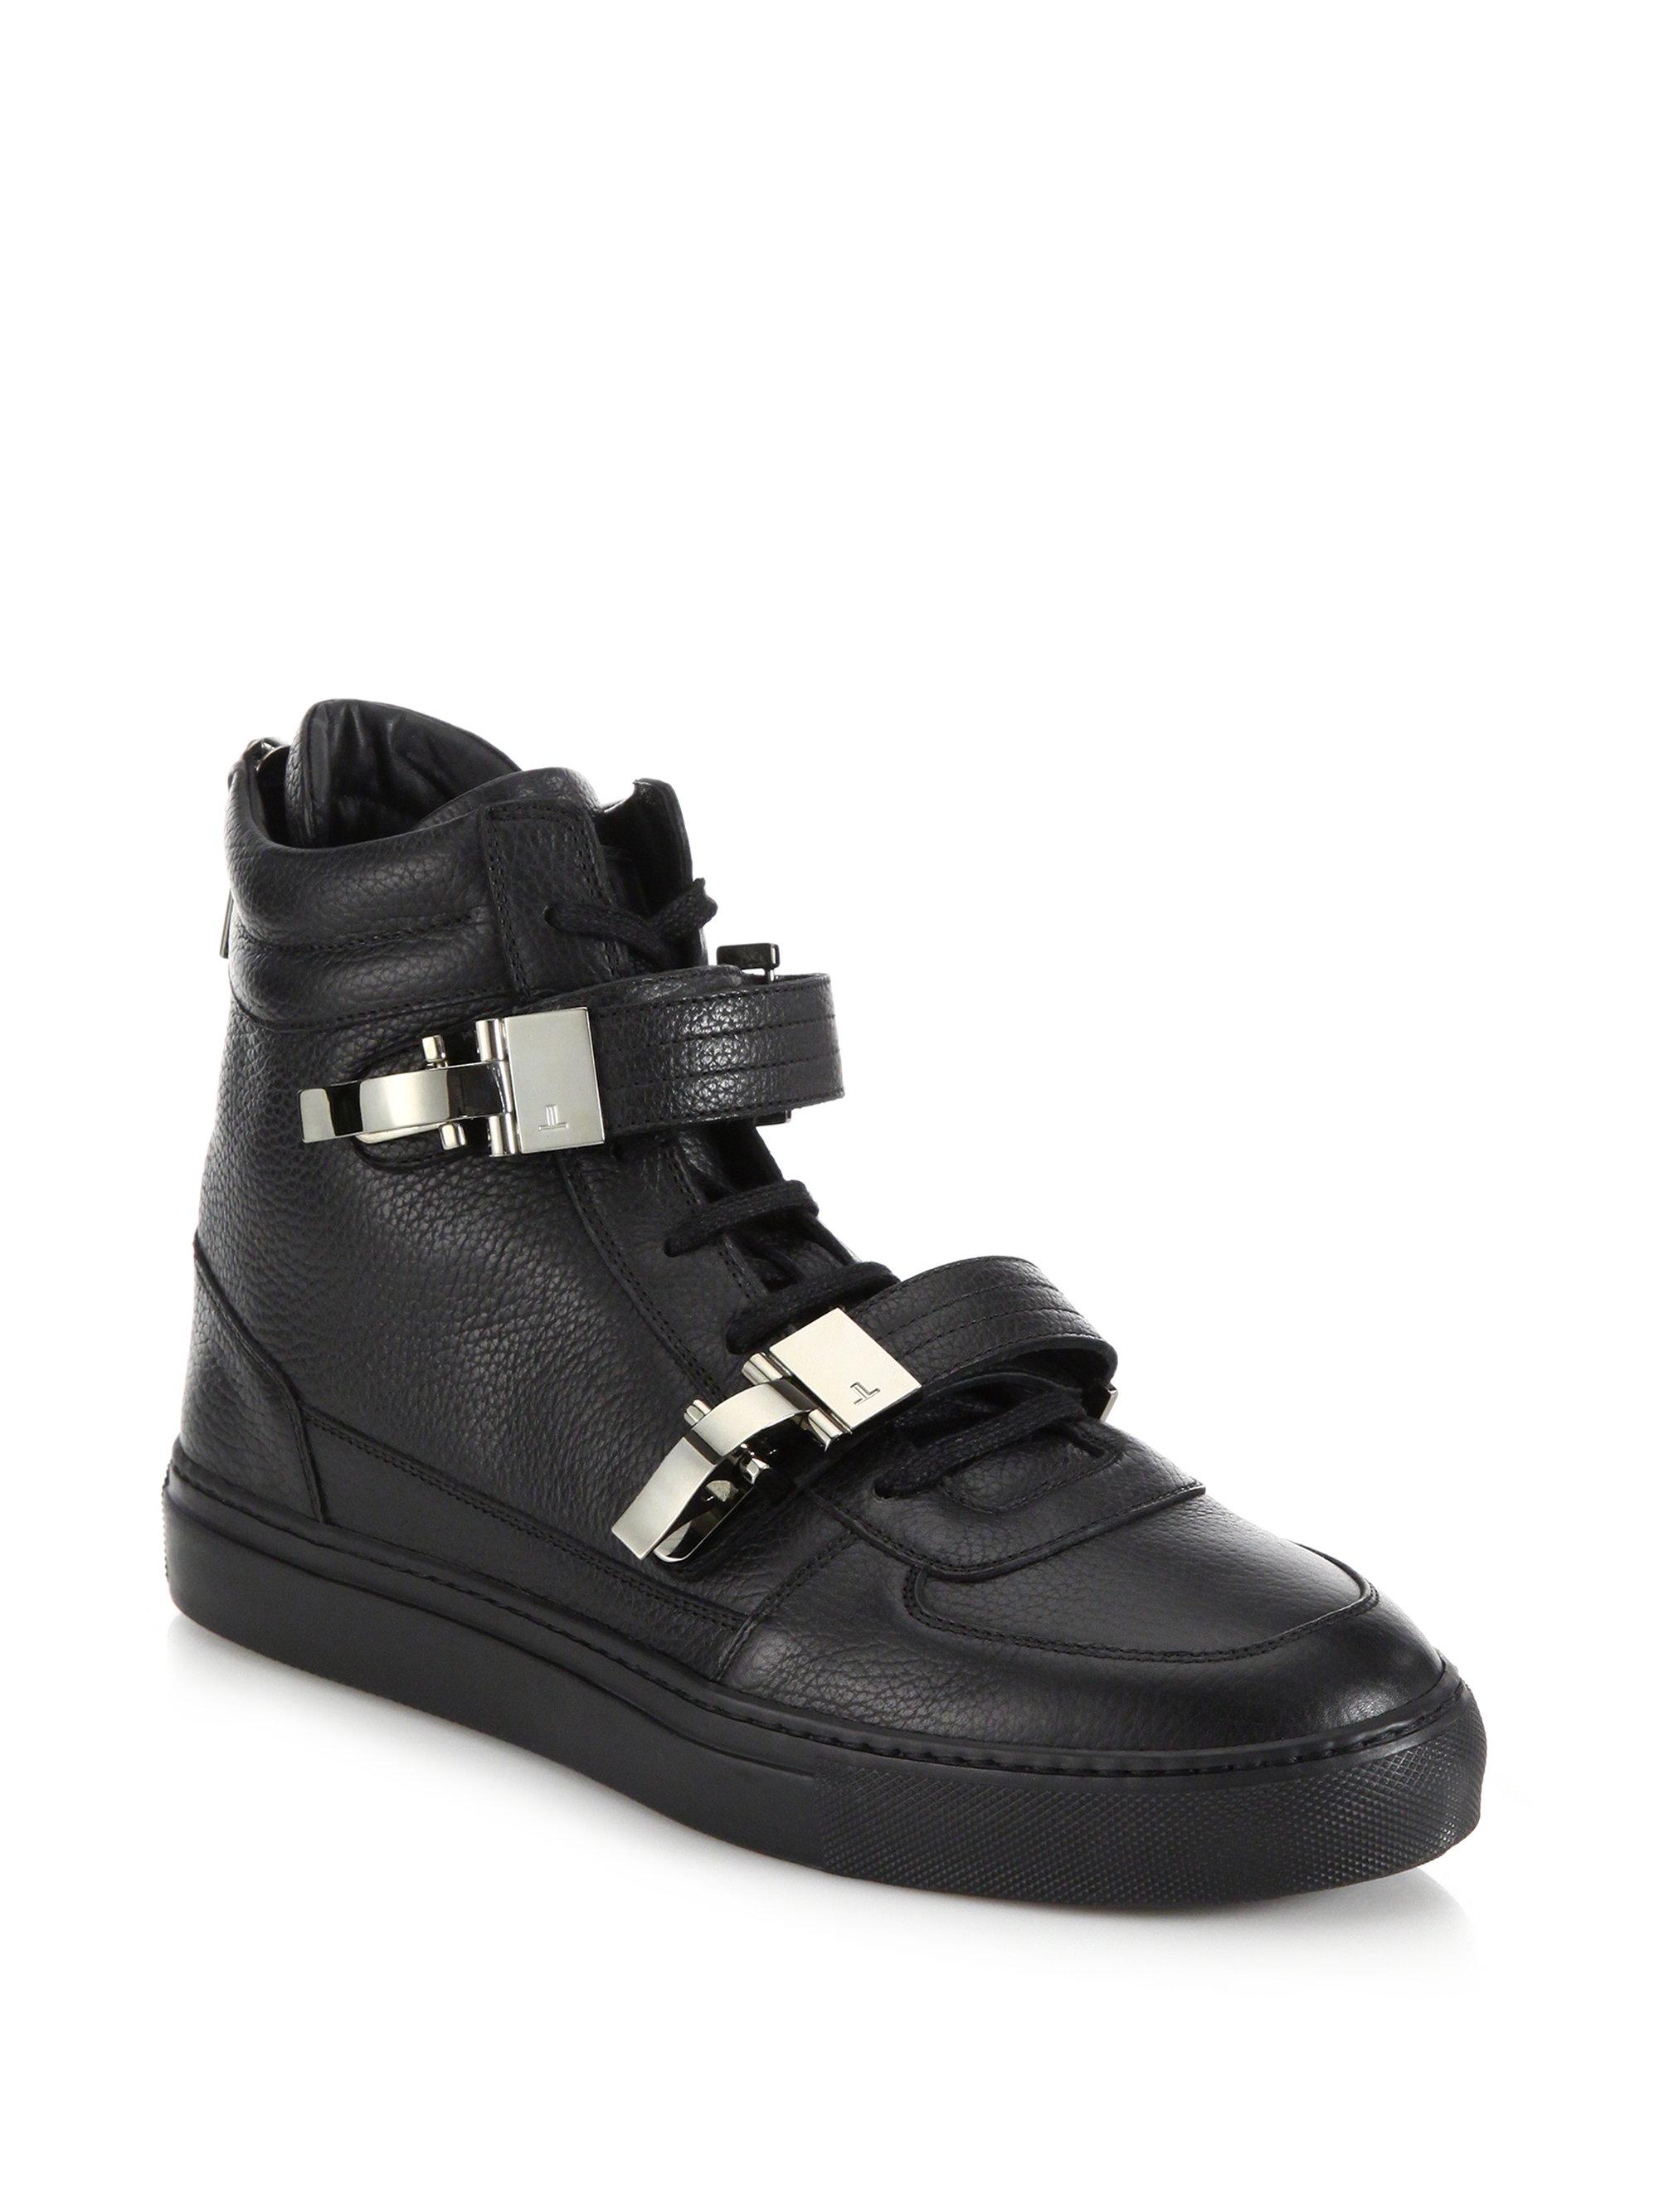 Lyst Louis Leeman Double Buckle Leather High Top